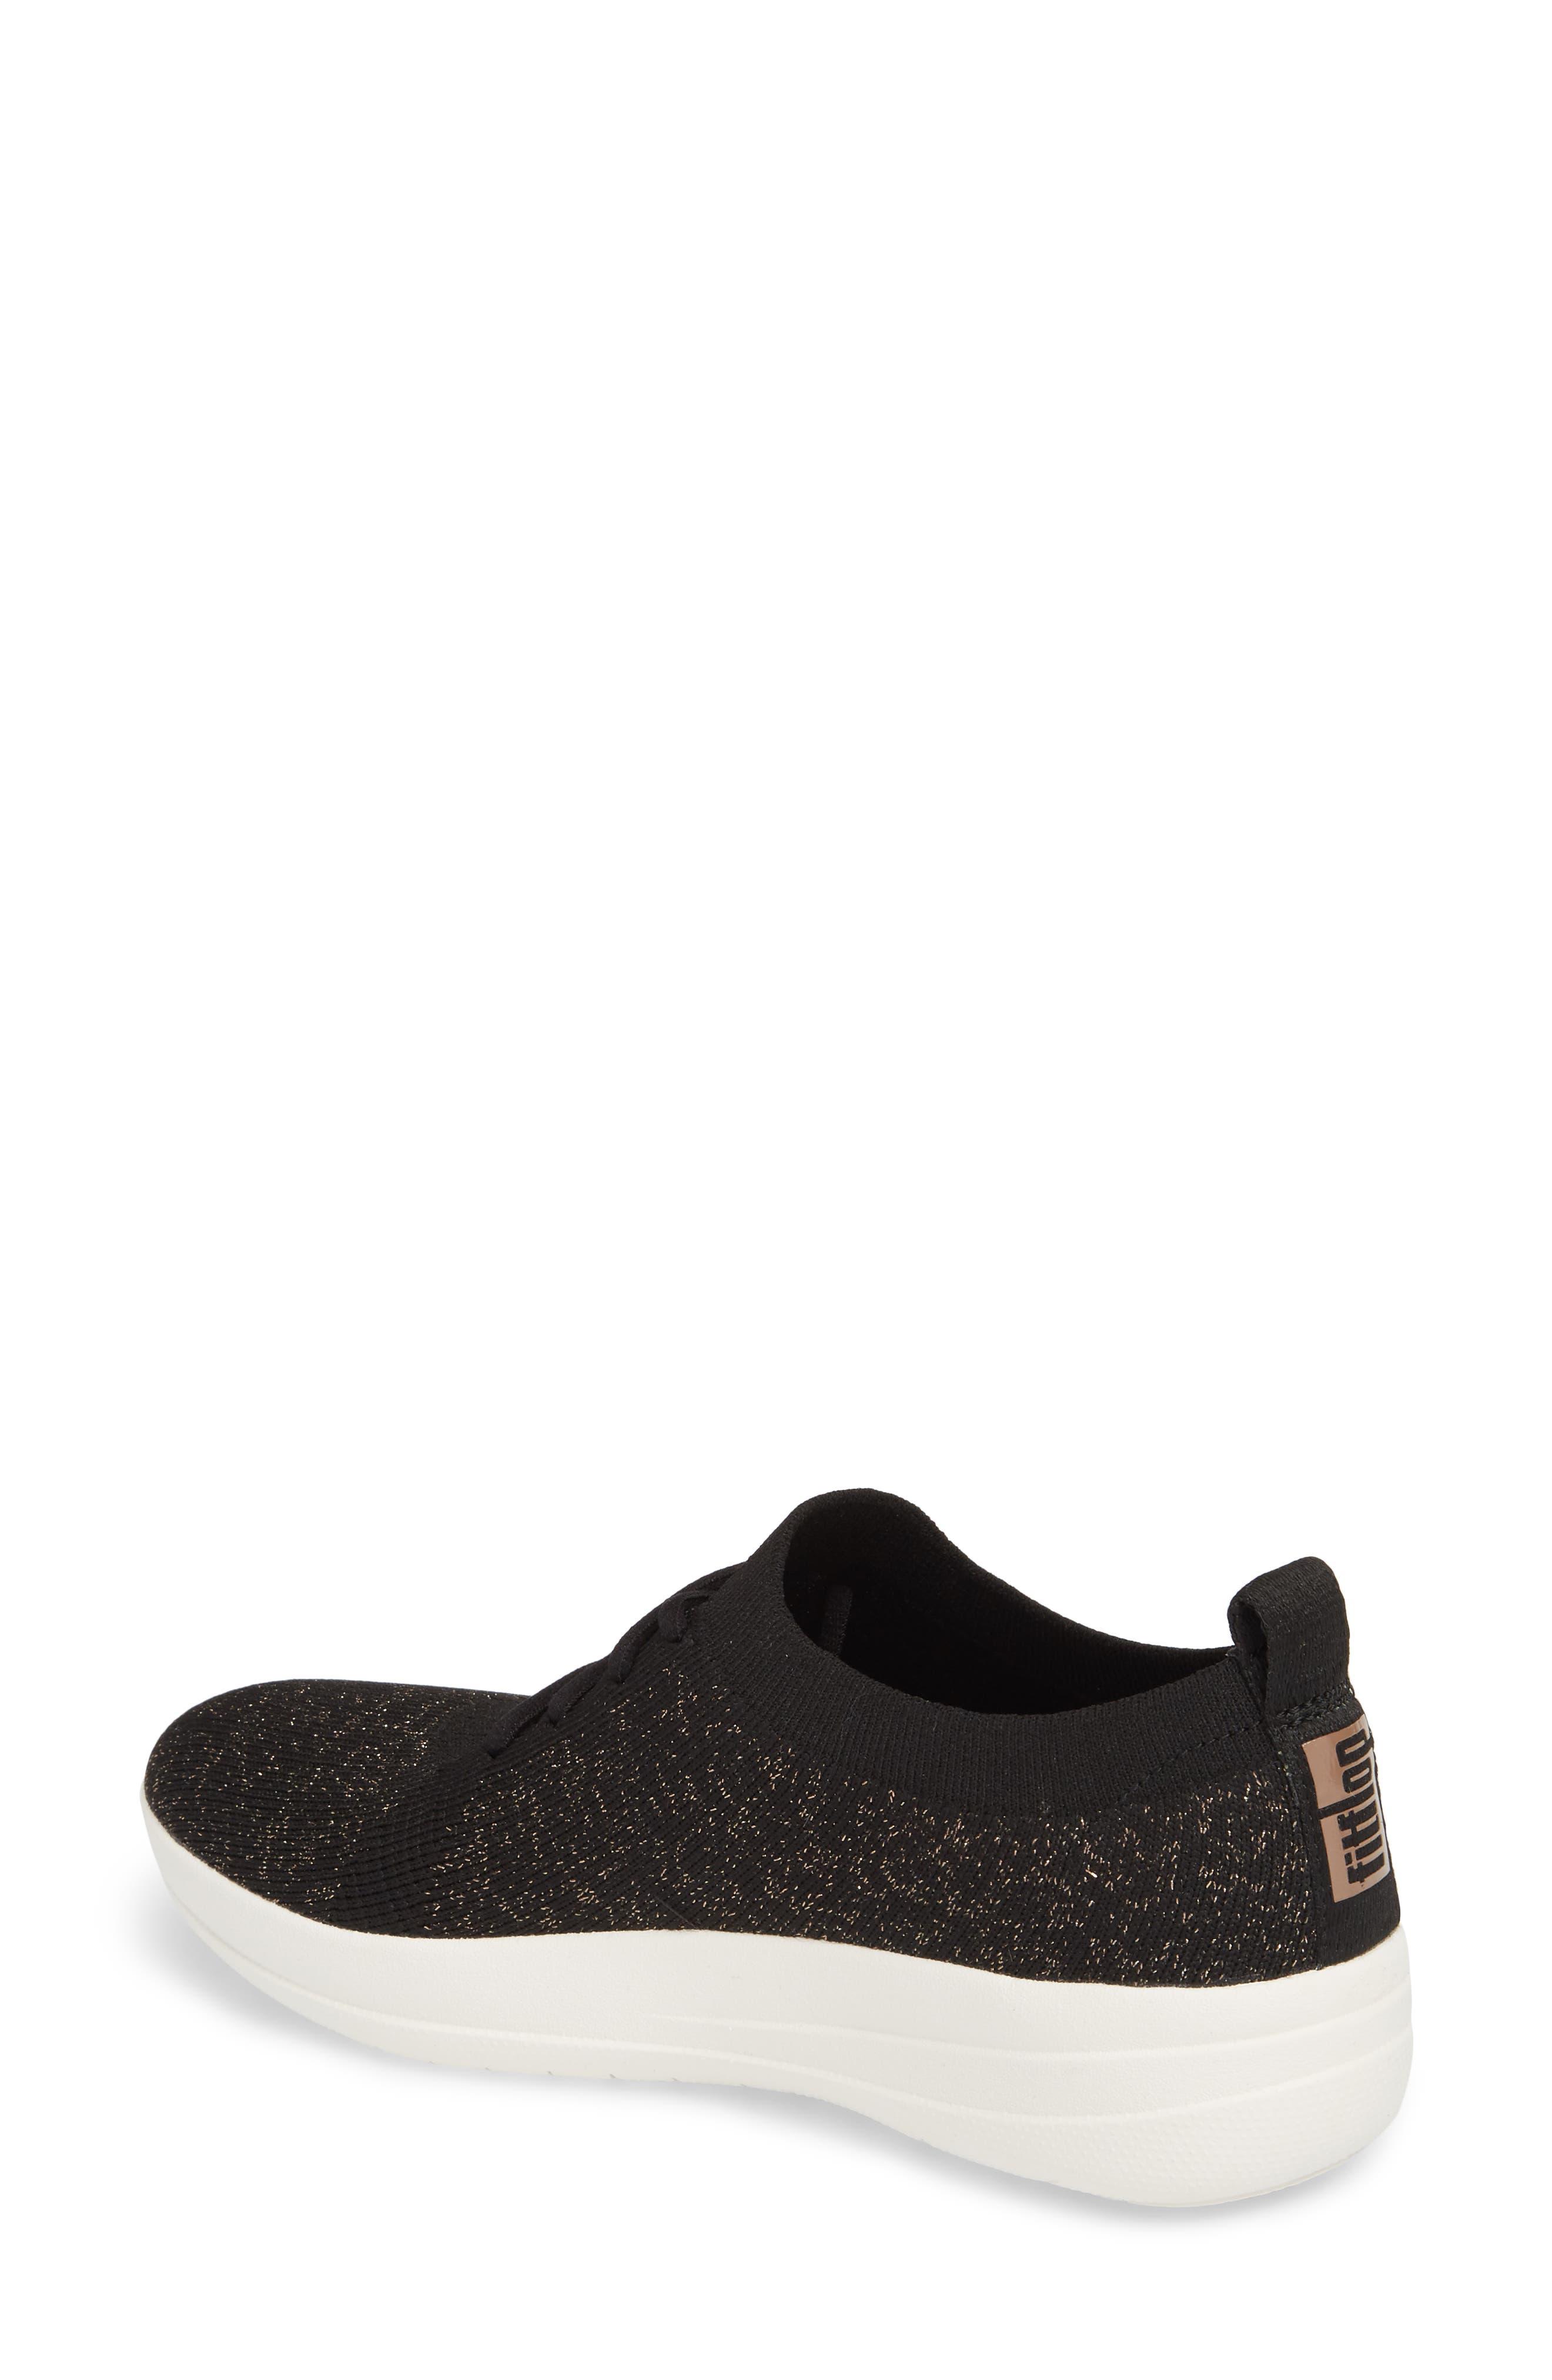 Uberknit<sup>™</sup> F-Sporty Sneaker,                             Alternate thumbnail 2, color,                             BLACK FABRIC